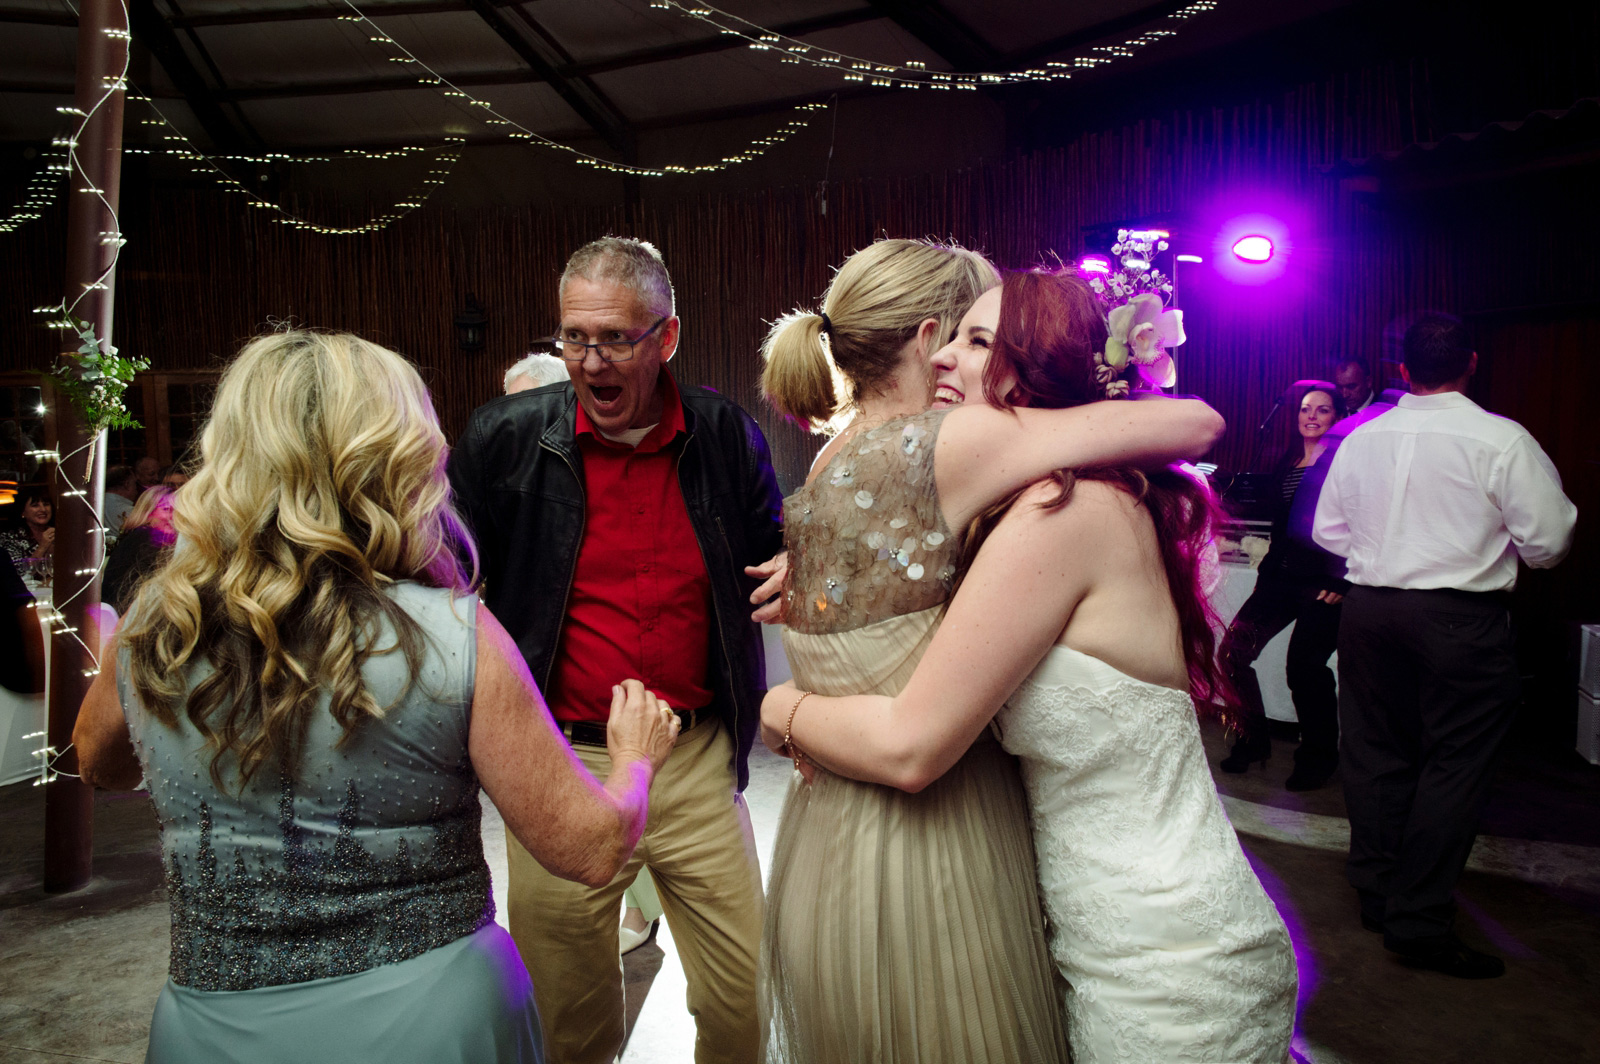 bride and guests at wedding